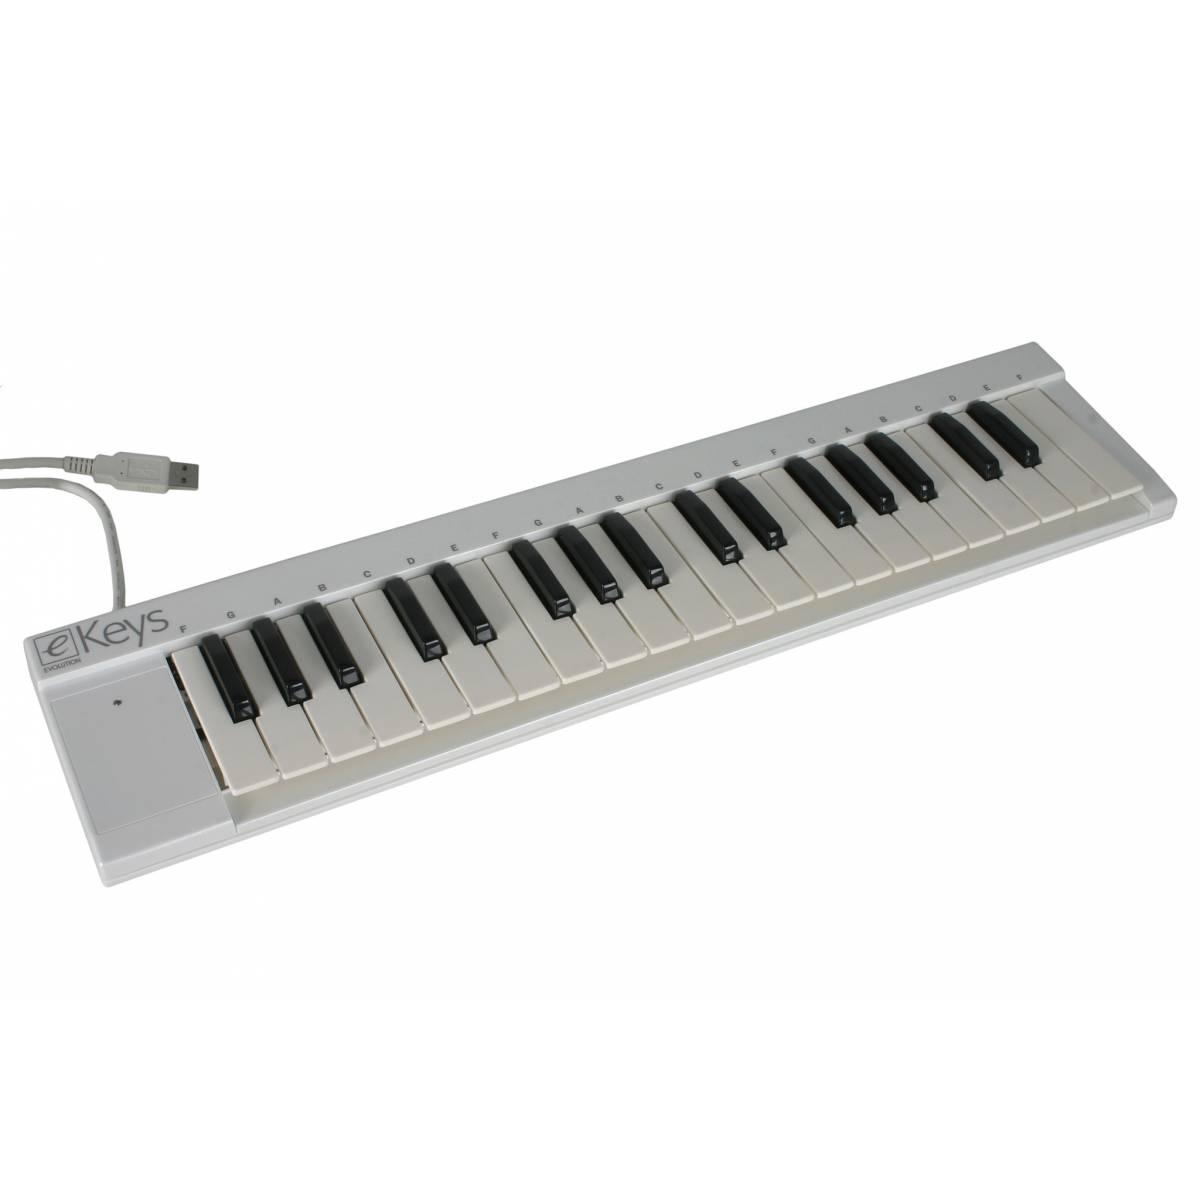 m audio e keys 37 compact mini keyboard 37 key midi keyboard from inta audio uk. Black Bedroom Furniture Sets. Home Design Ideas